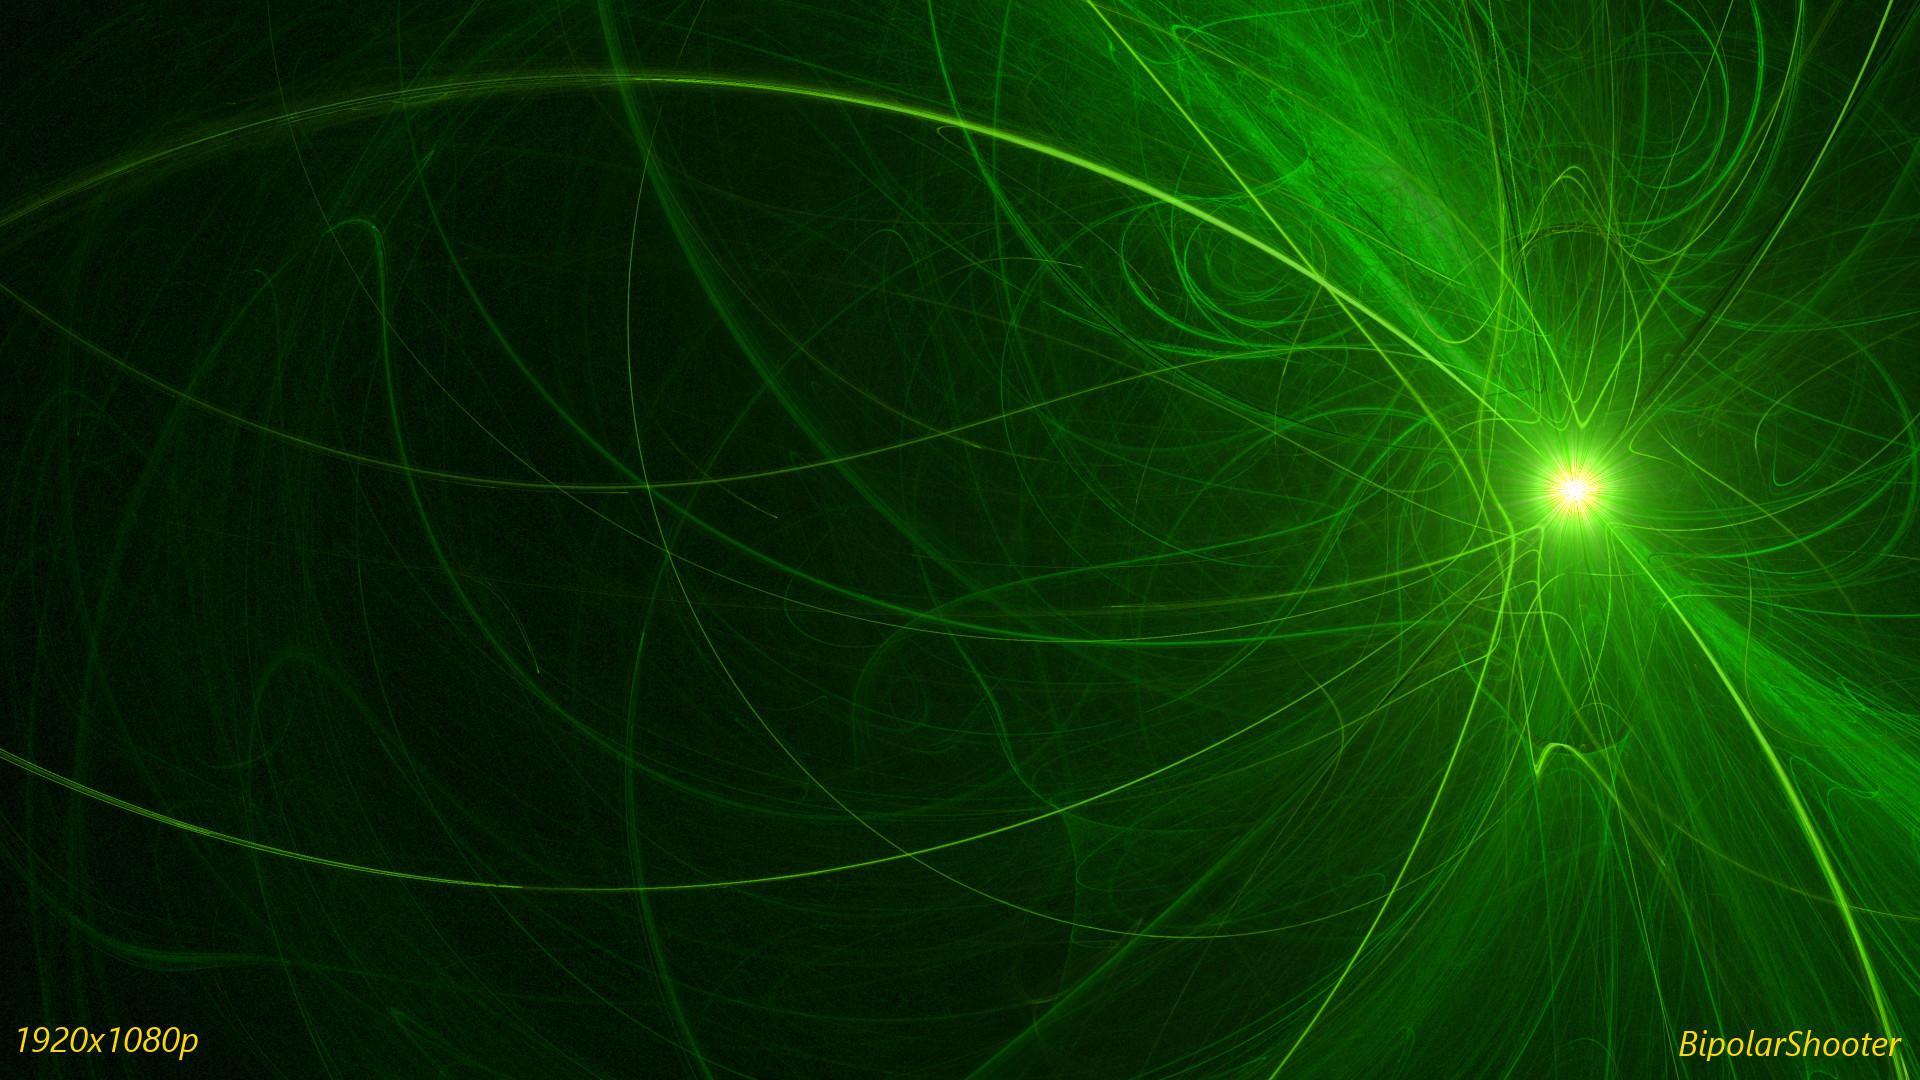 Emerald Supernova HD Wallpaper by BipolarShooter on .